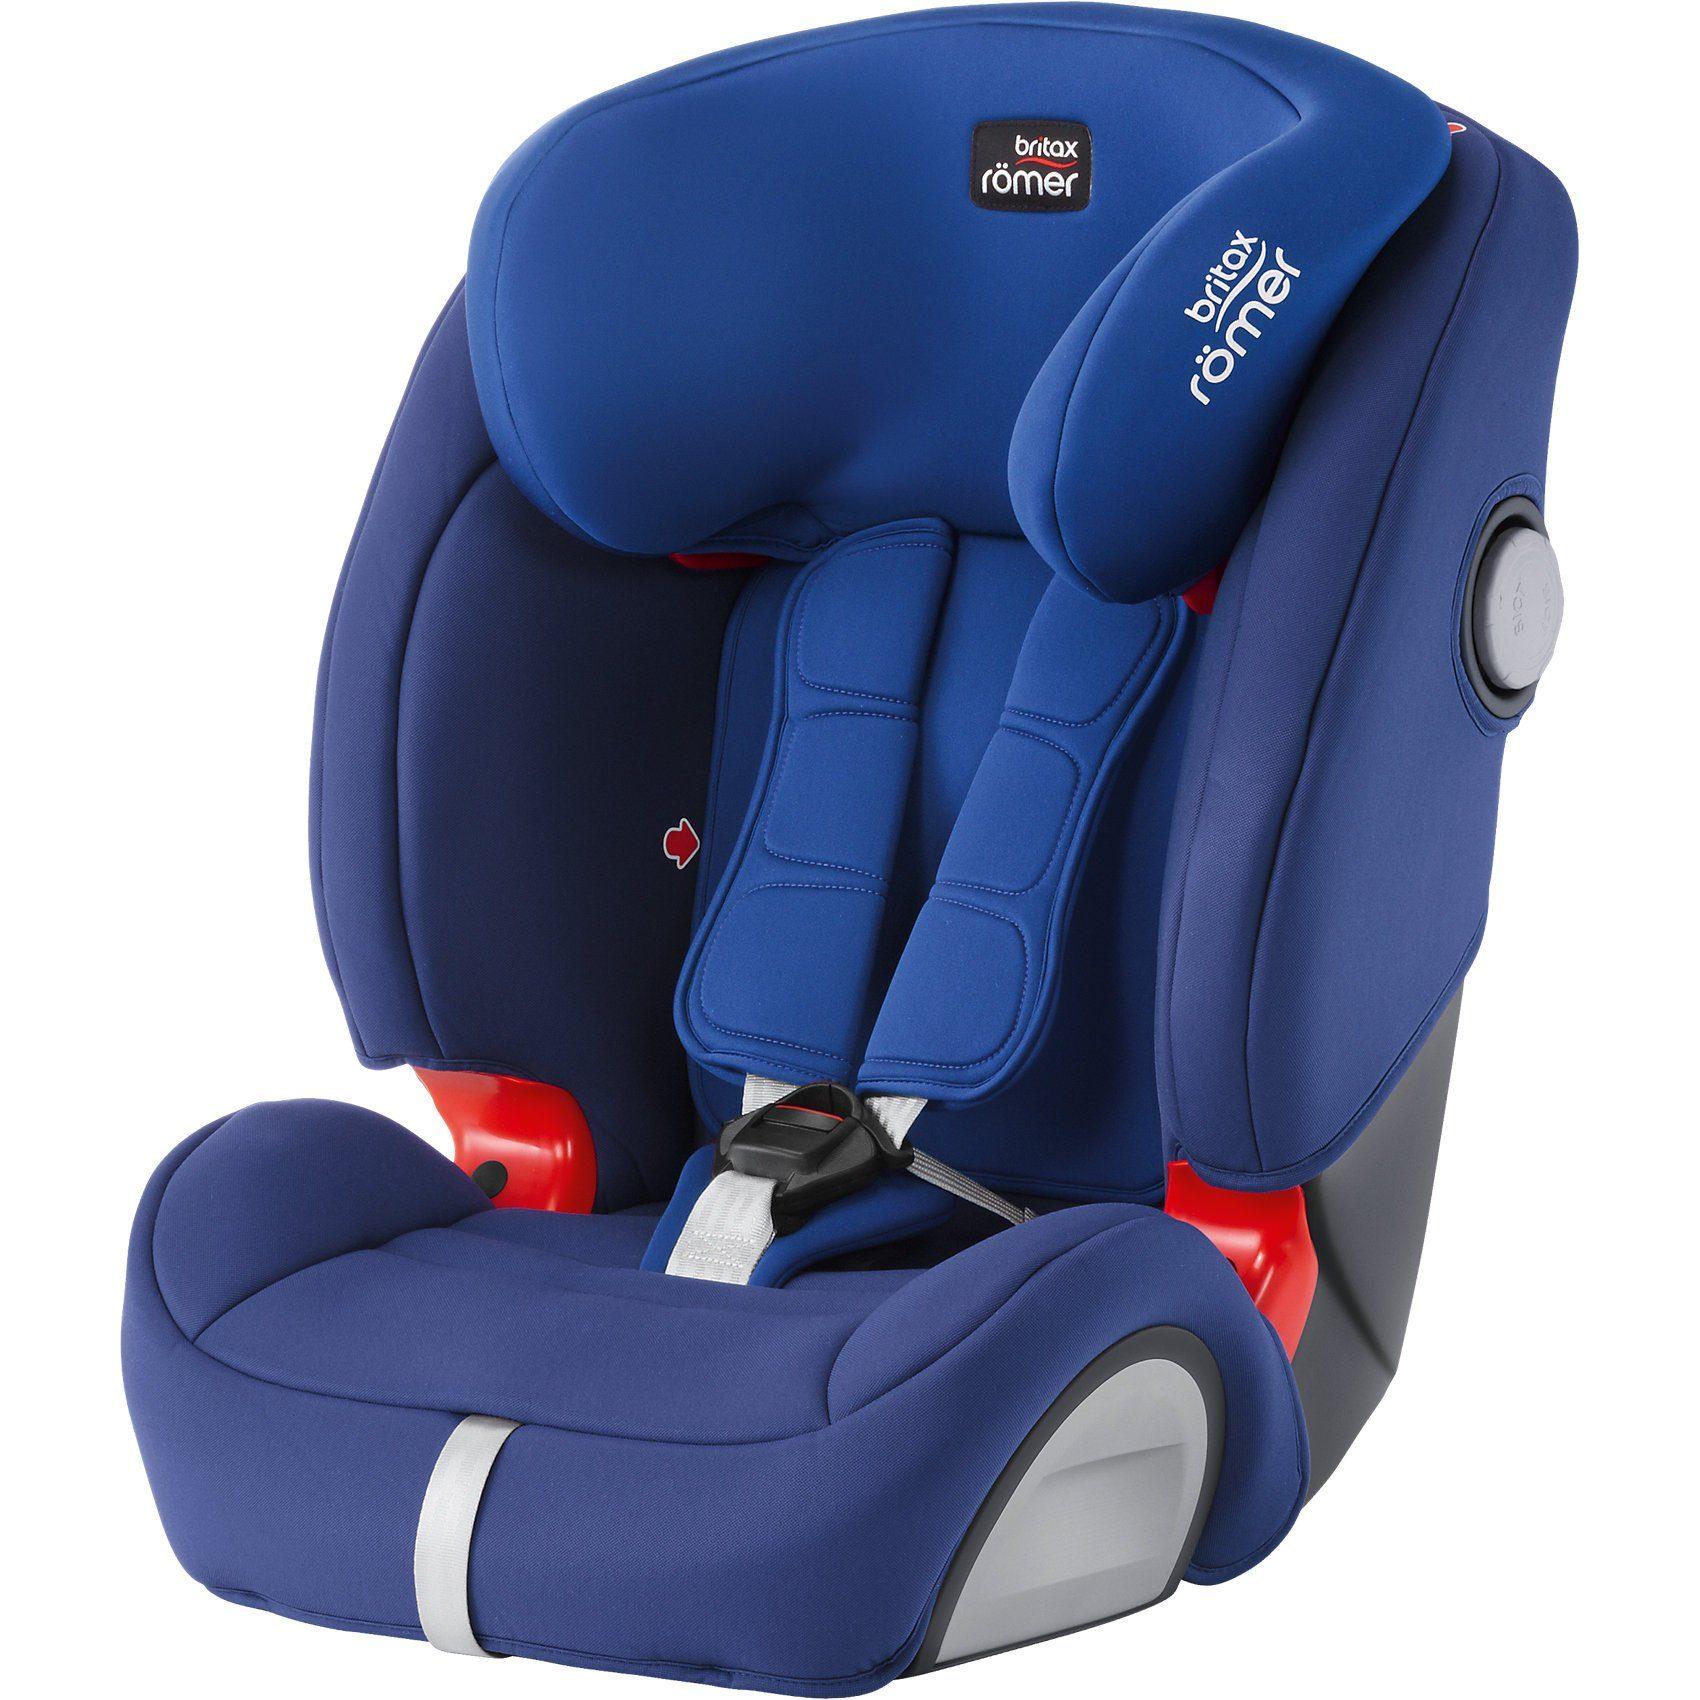 Britax Römer Auto-Kindersitz Evolva 1-2-3 SL SICT, Ocean Blue, 2017